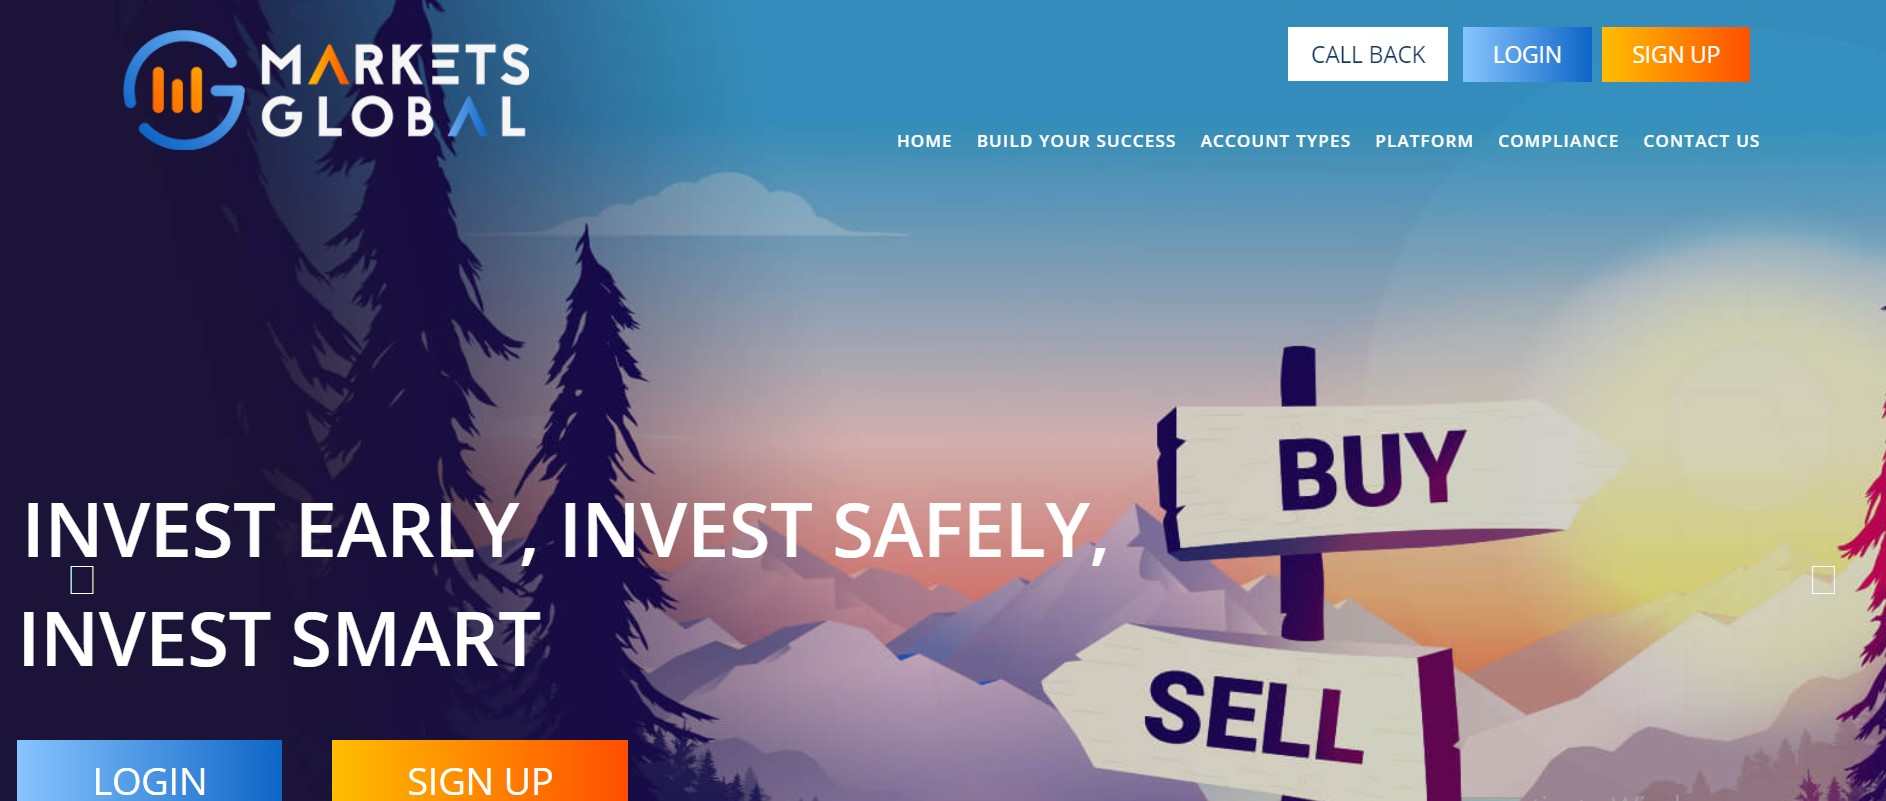 Markets Global website